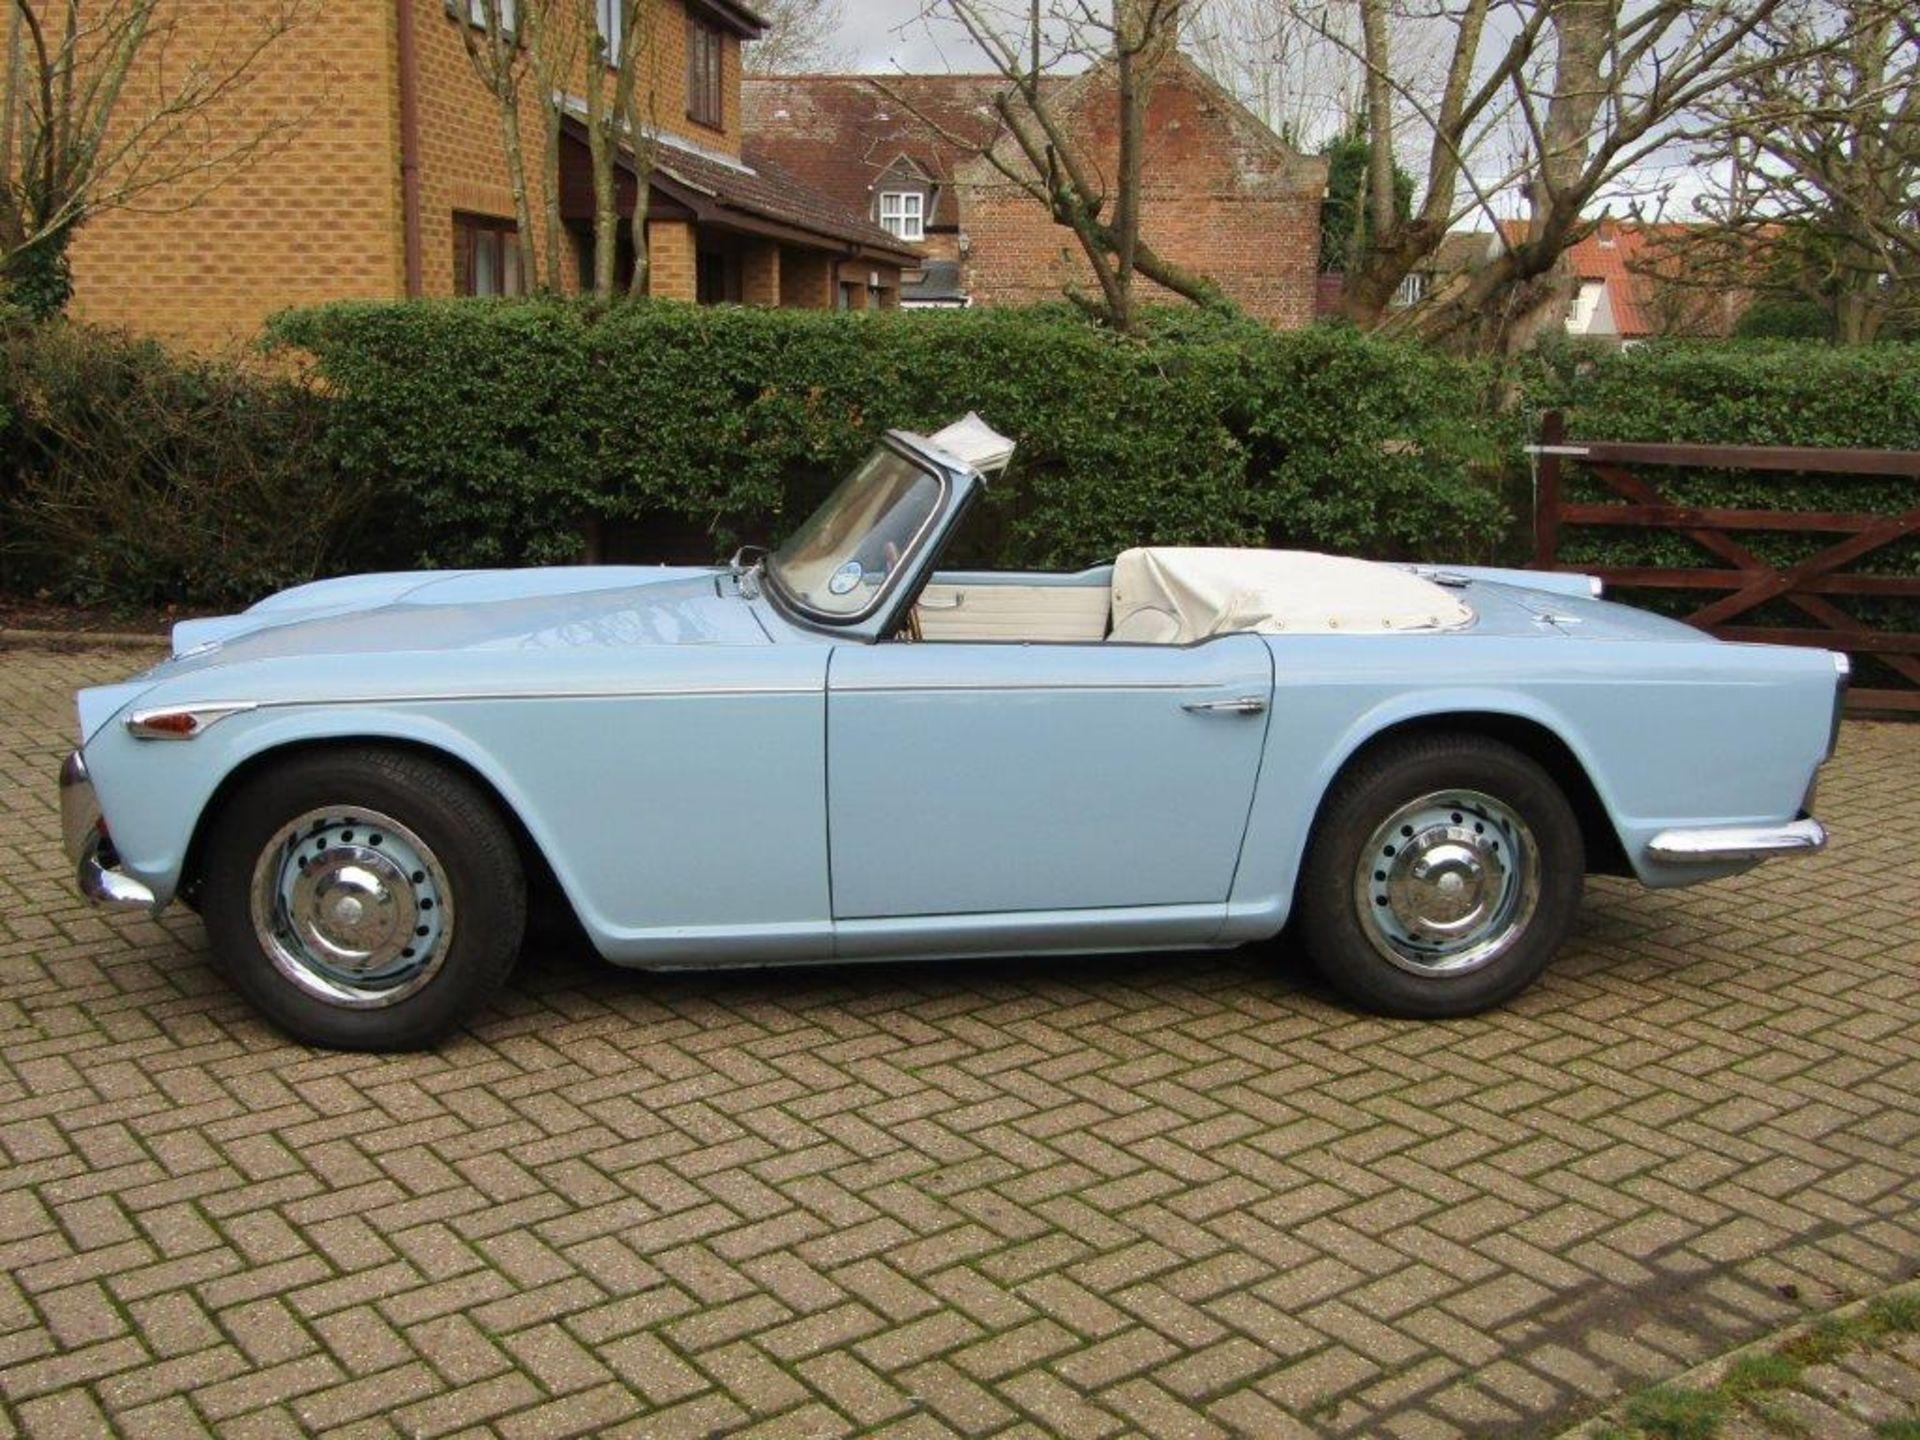 1965 Triumph TR4 - Image 5 of 17